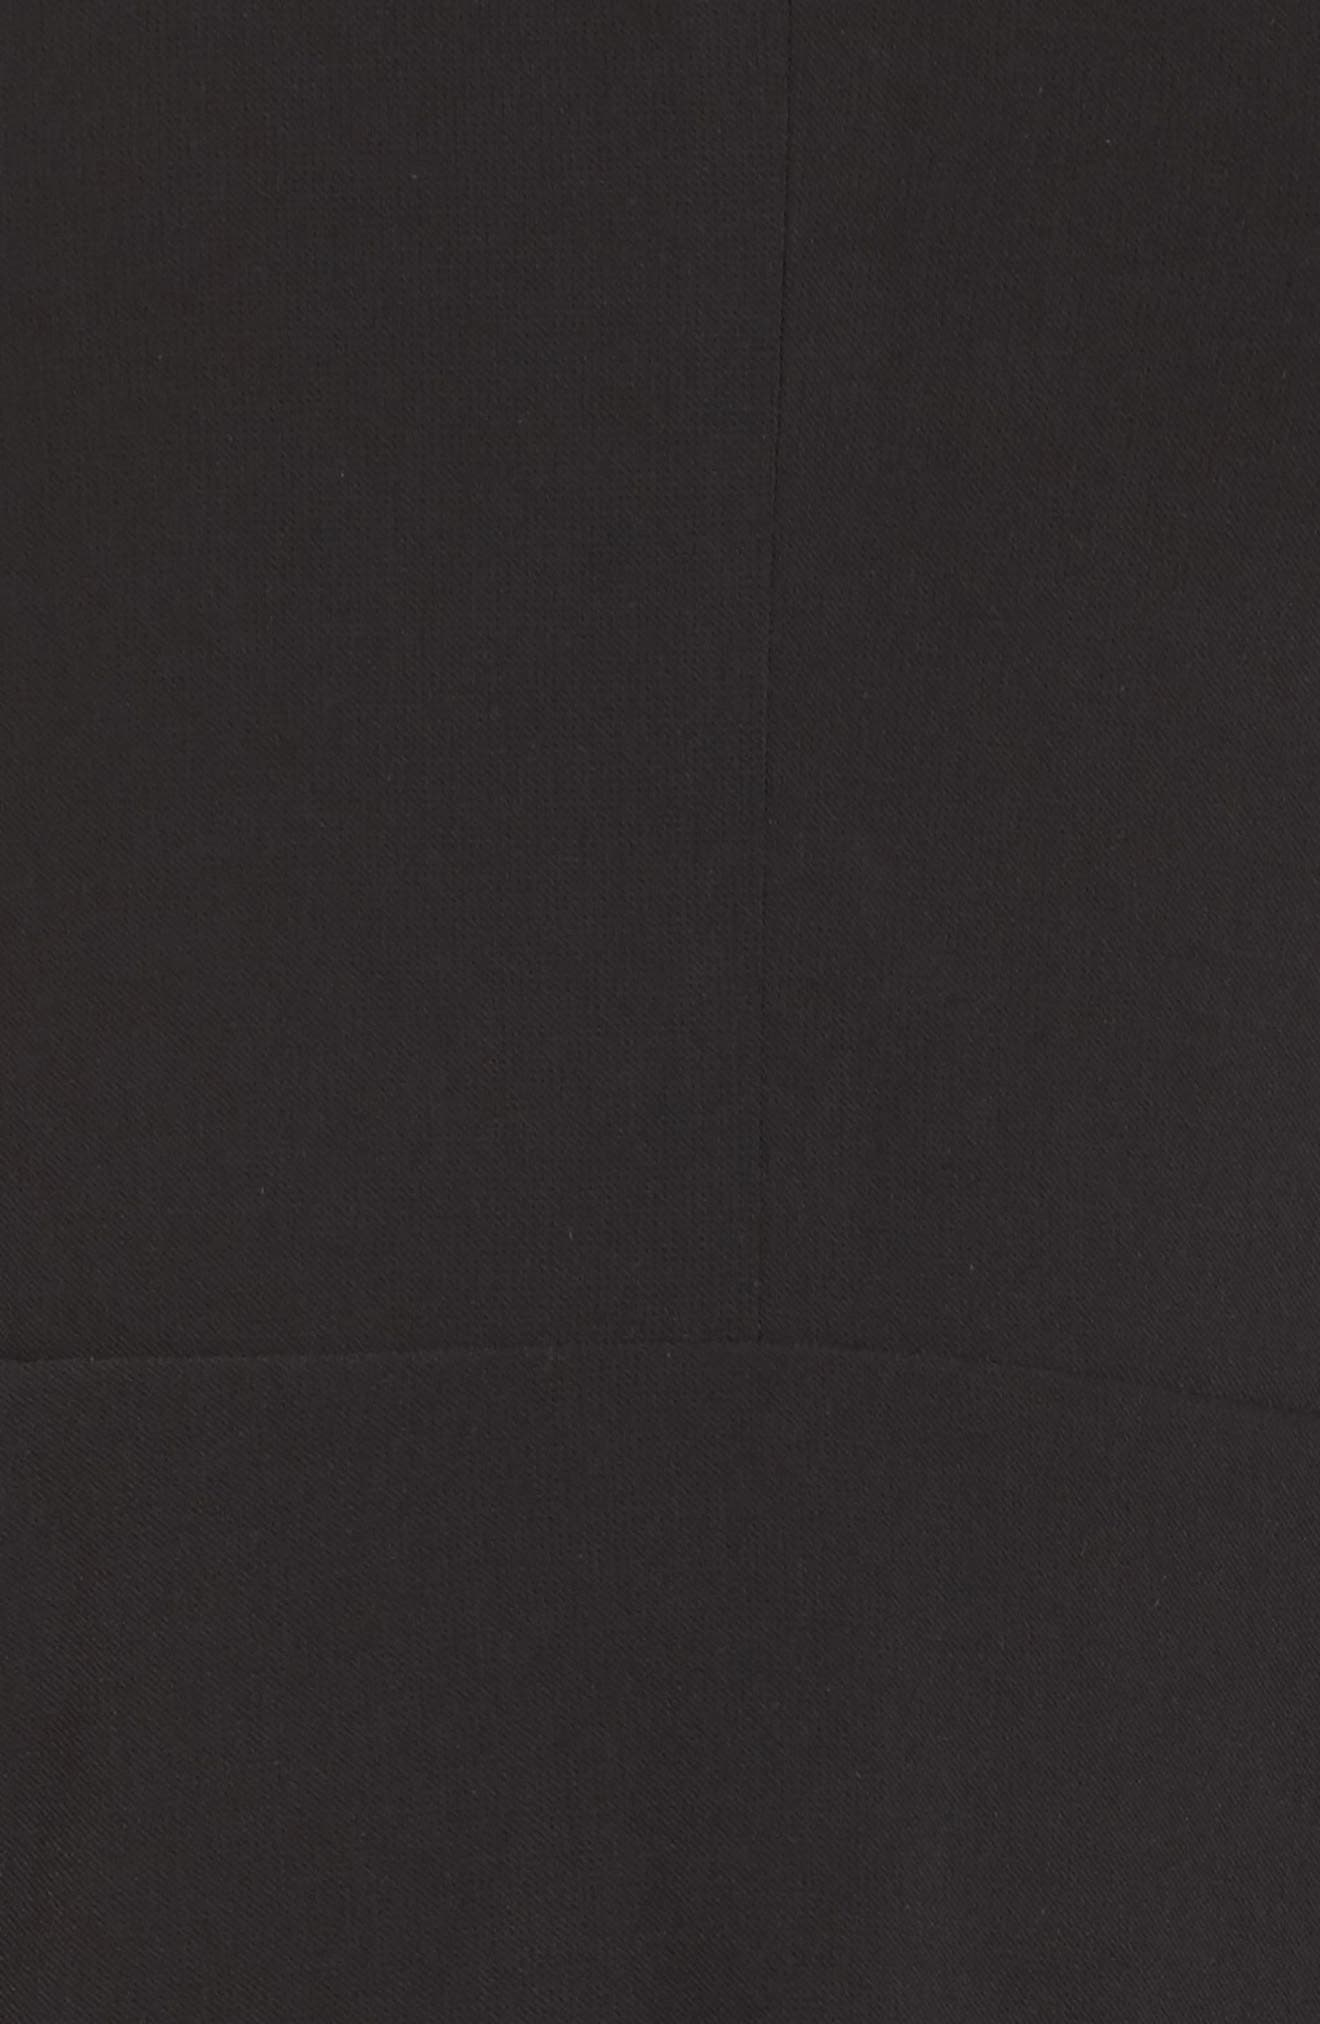 Zahara Cutout Fit & Flare Dress,                             Alternate thumbnail 5, color,                             001